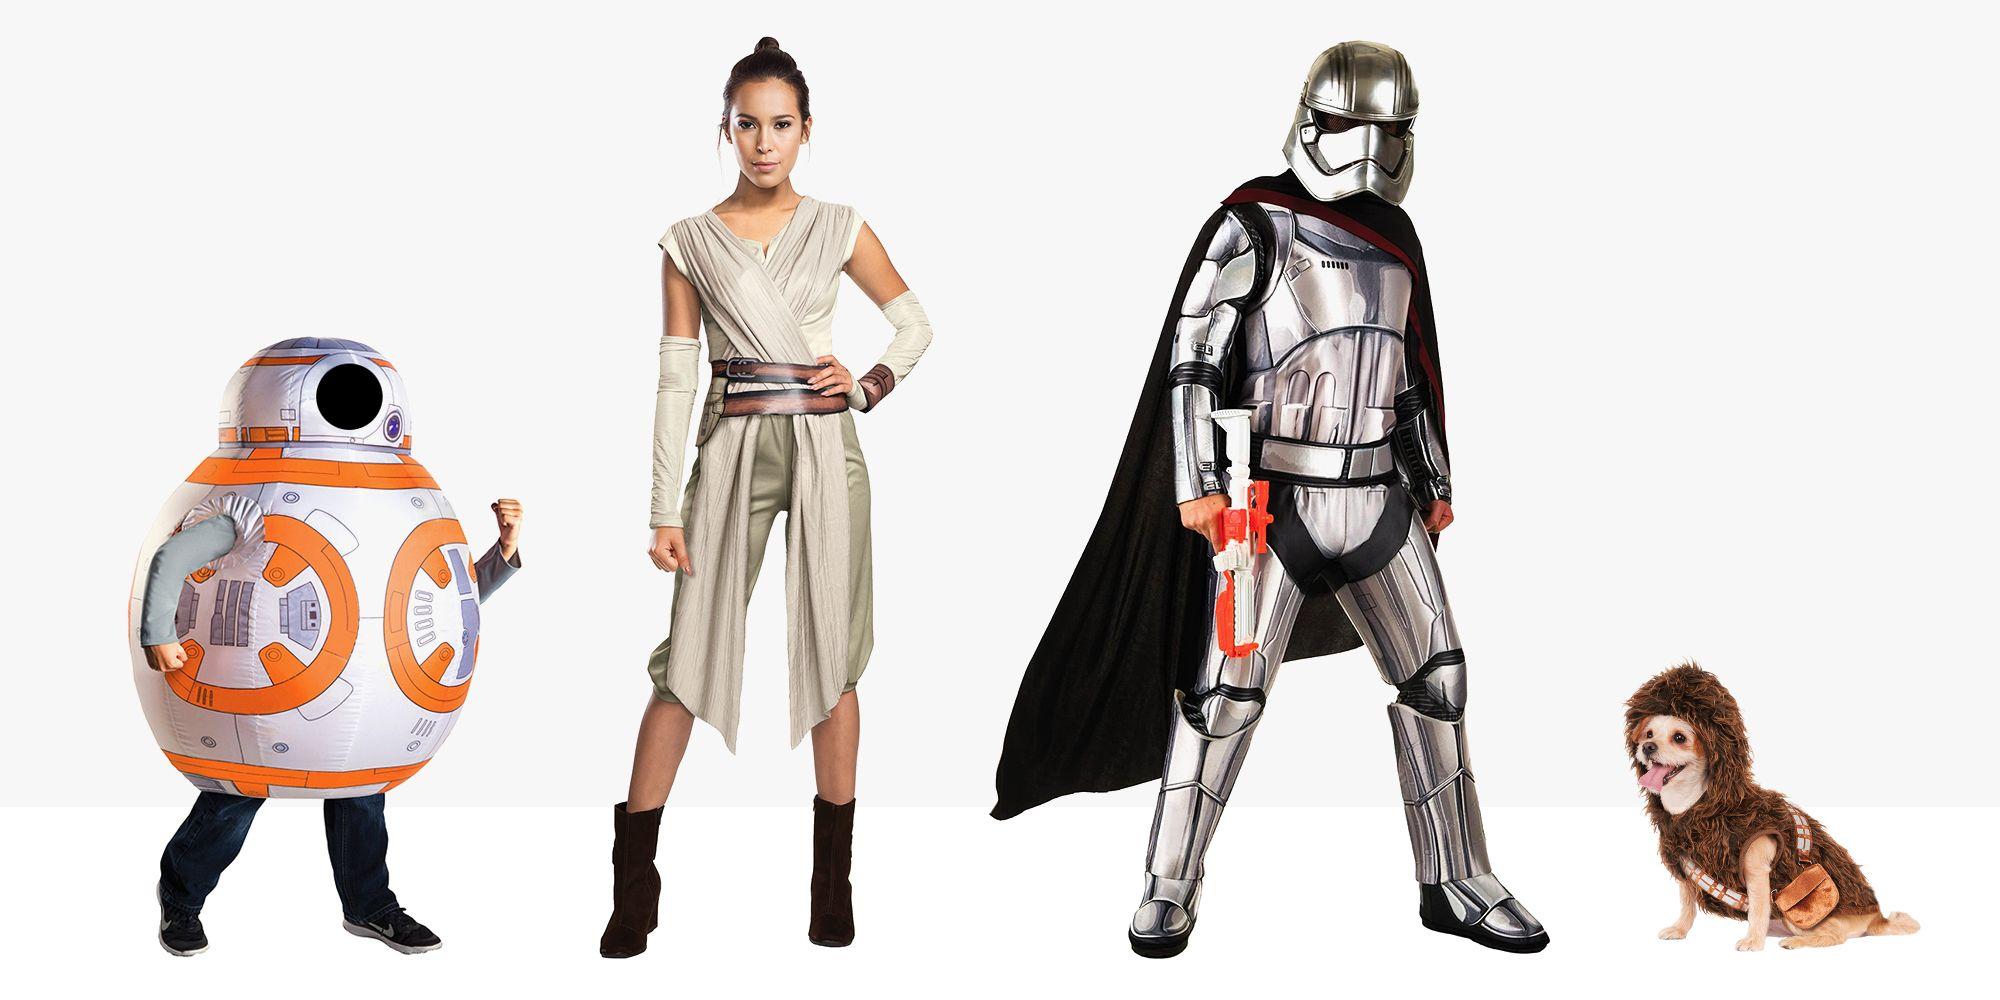 15 Best Star Wars Costumes for Halloween 2018 - Star Wars ...